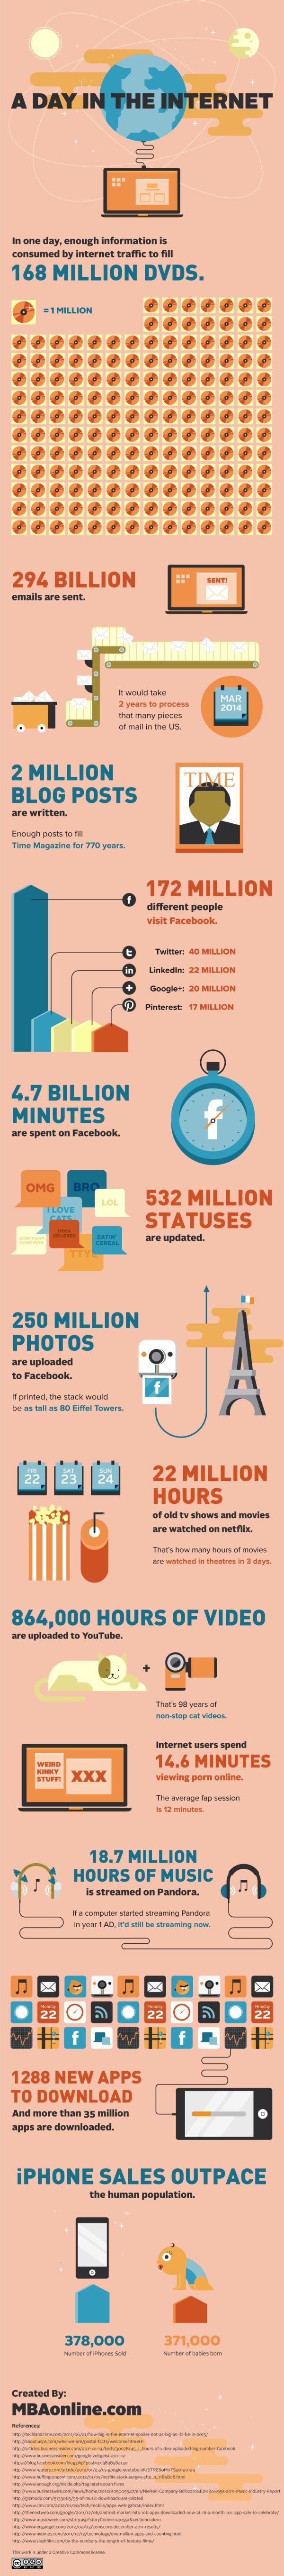 Ein Tag im Internet Infografik